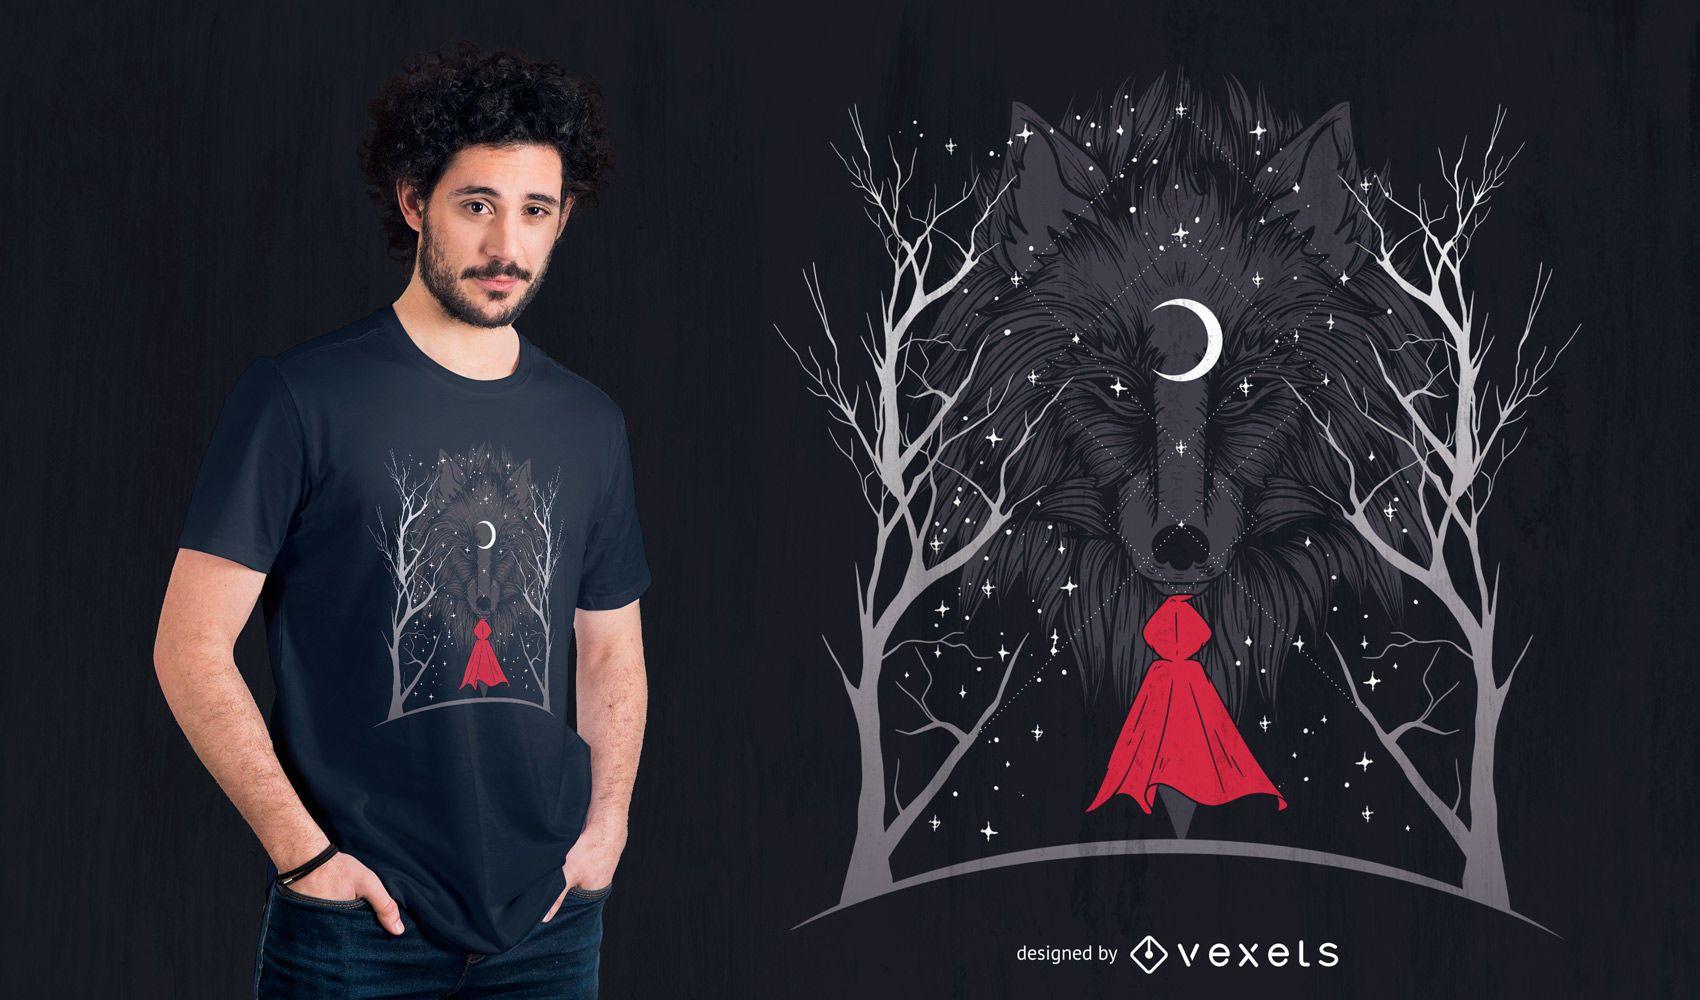 Red hood night t-shirt design